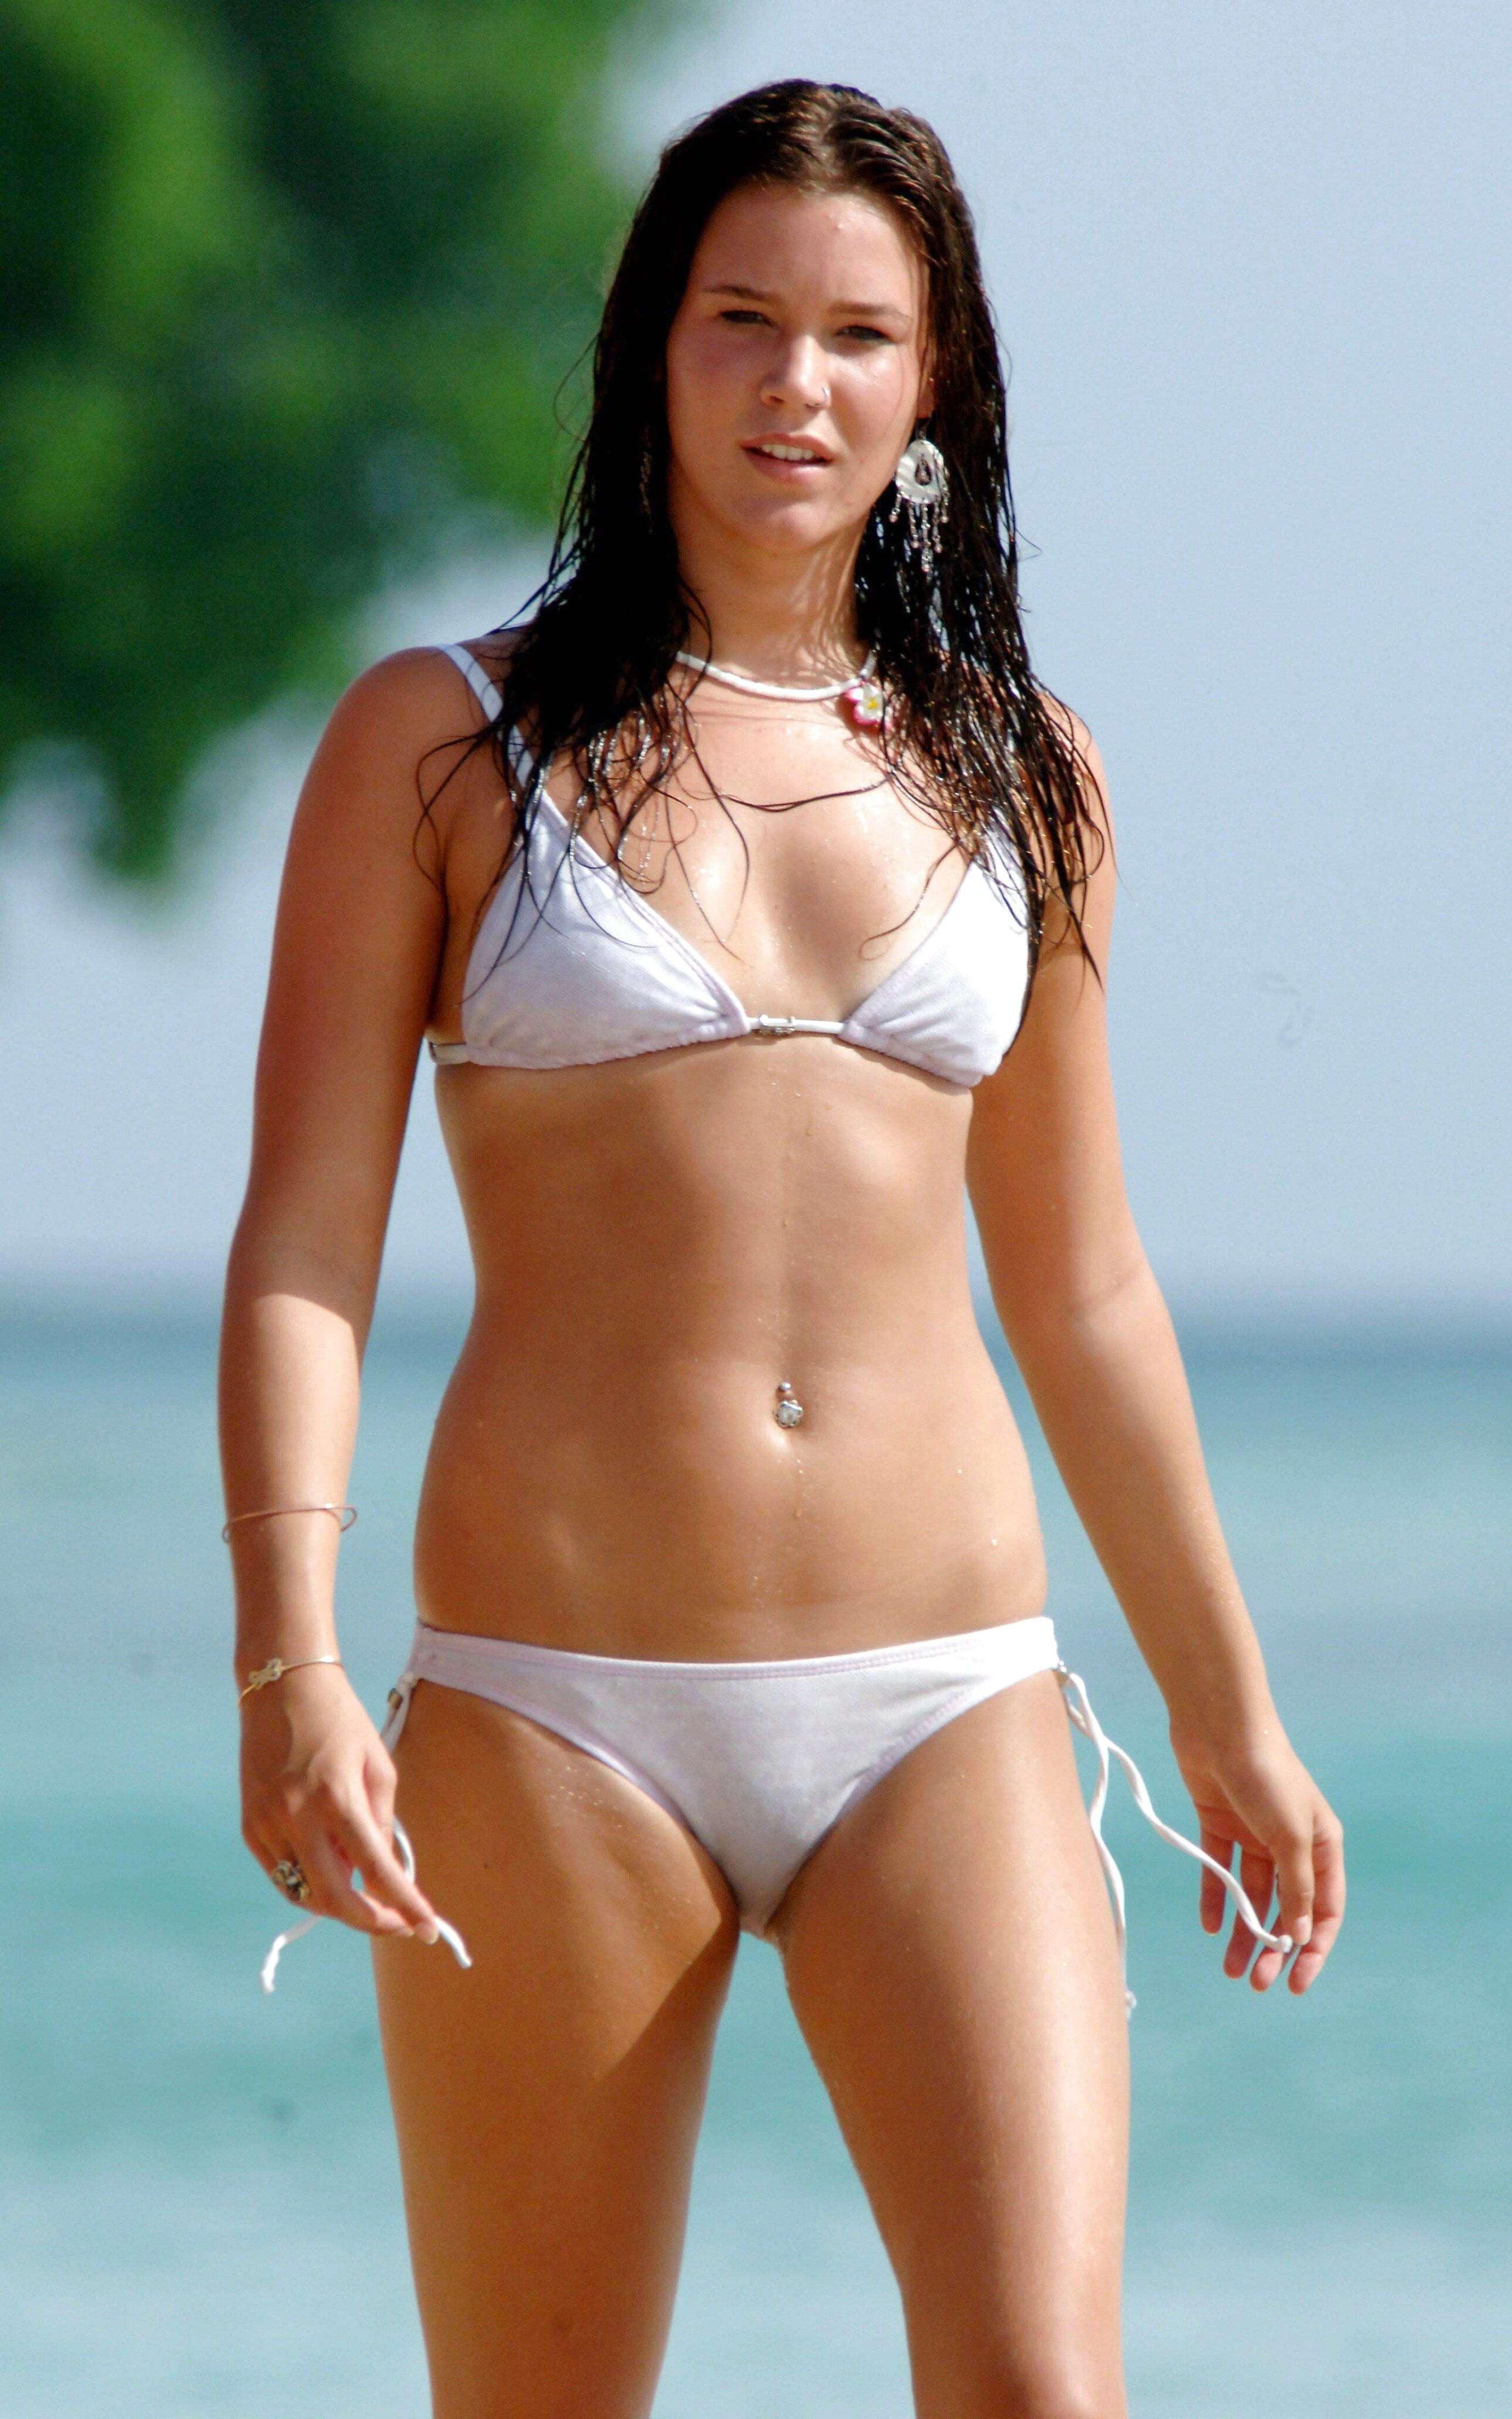 Joss Stone Bikini Pictures 3 Famosos Pinterest